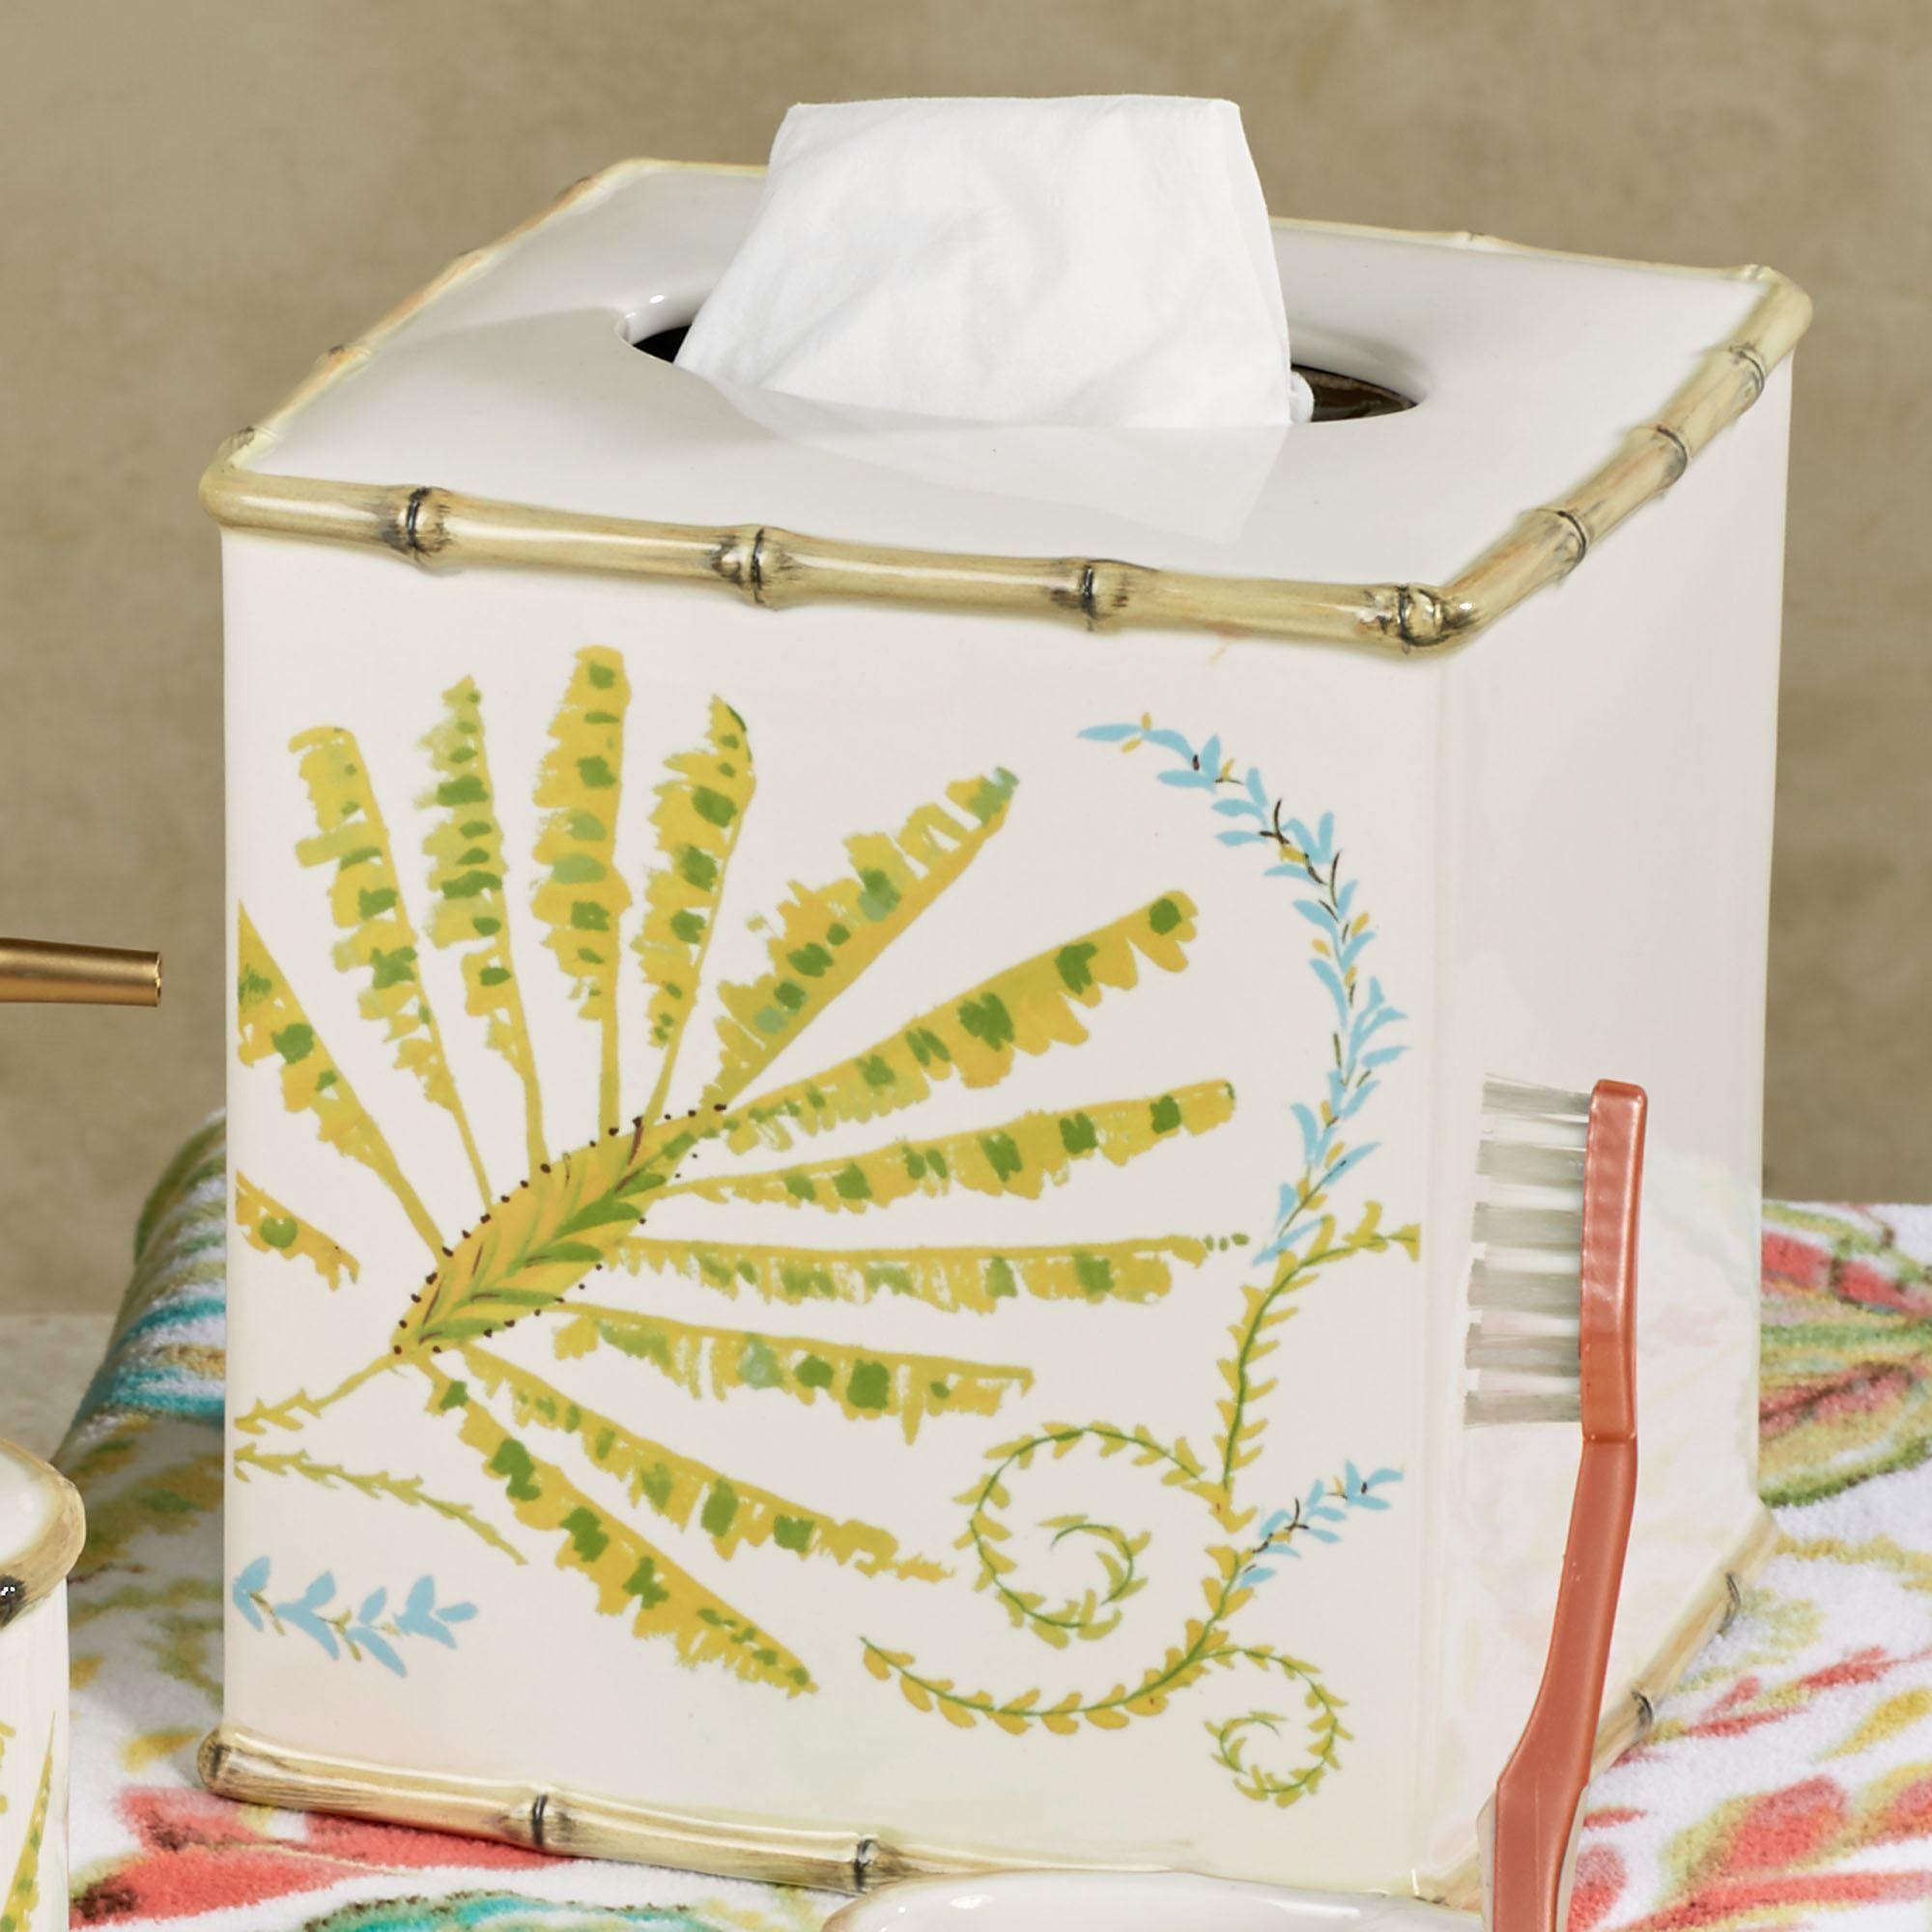 Tropical Palm Ceramic Bath Accessories by Dena Home